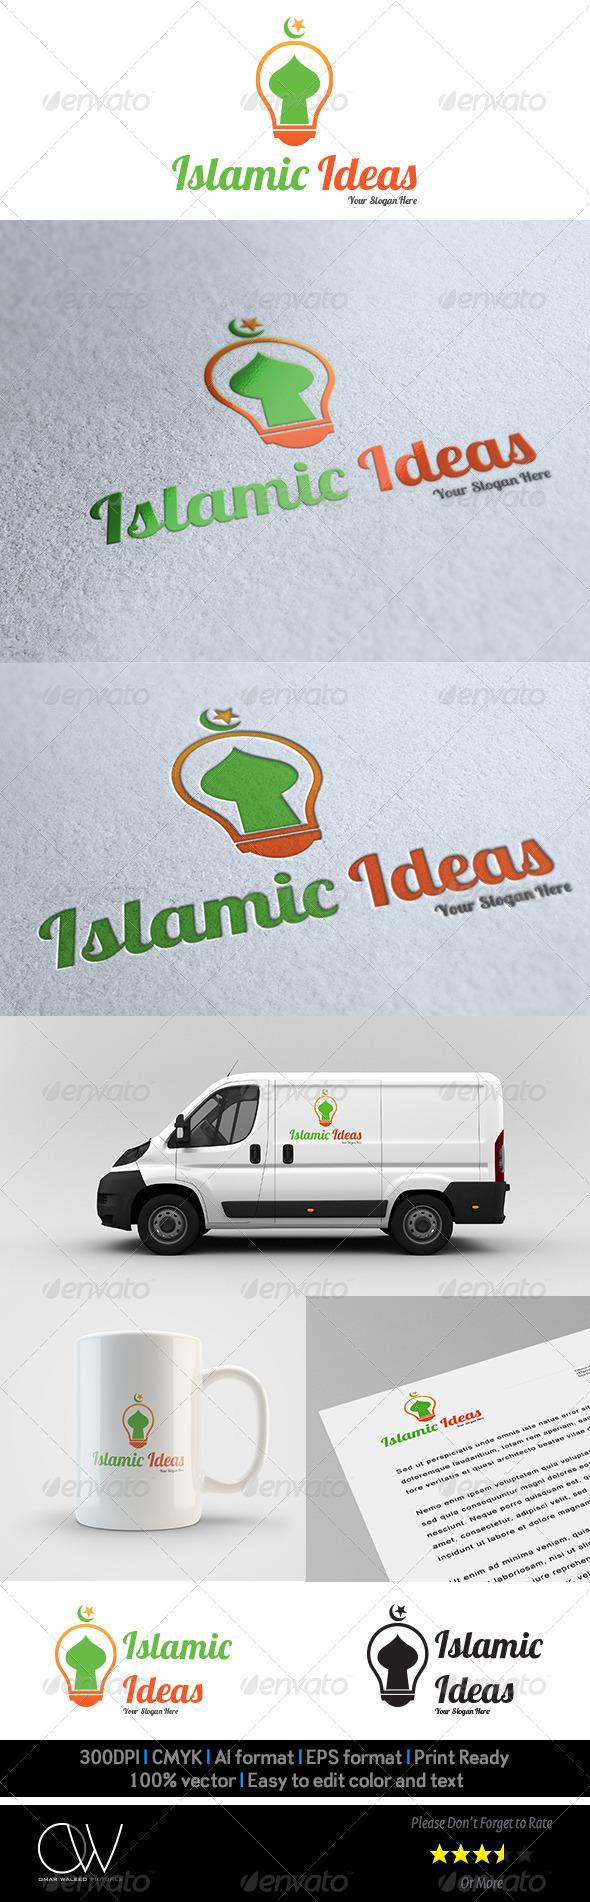 GraphicRiver Islamic Ideas Logo Template 5965222